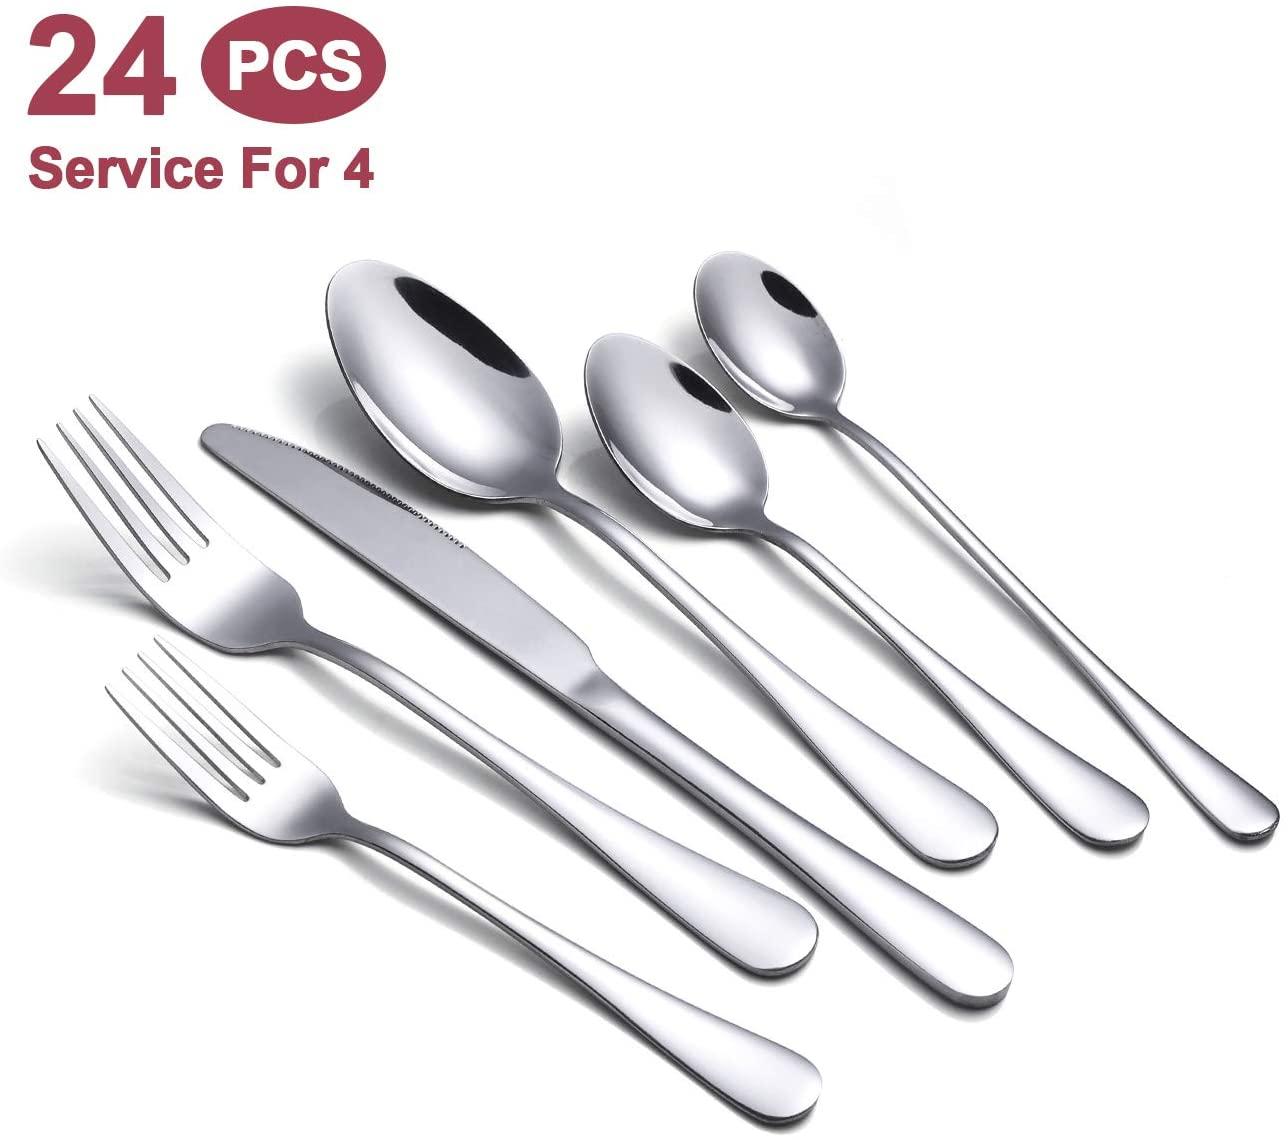 Silverware Set,24-Piece Stainless Steel Flatware Set,Cutlery Tableware Set For 4,Mirror Finish,Dishwasher Safe